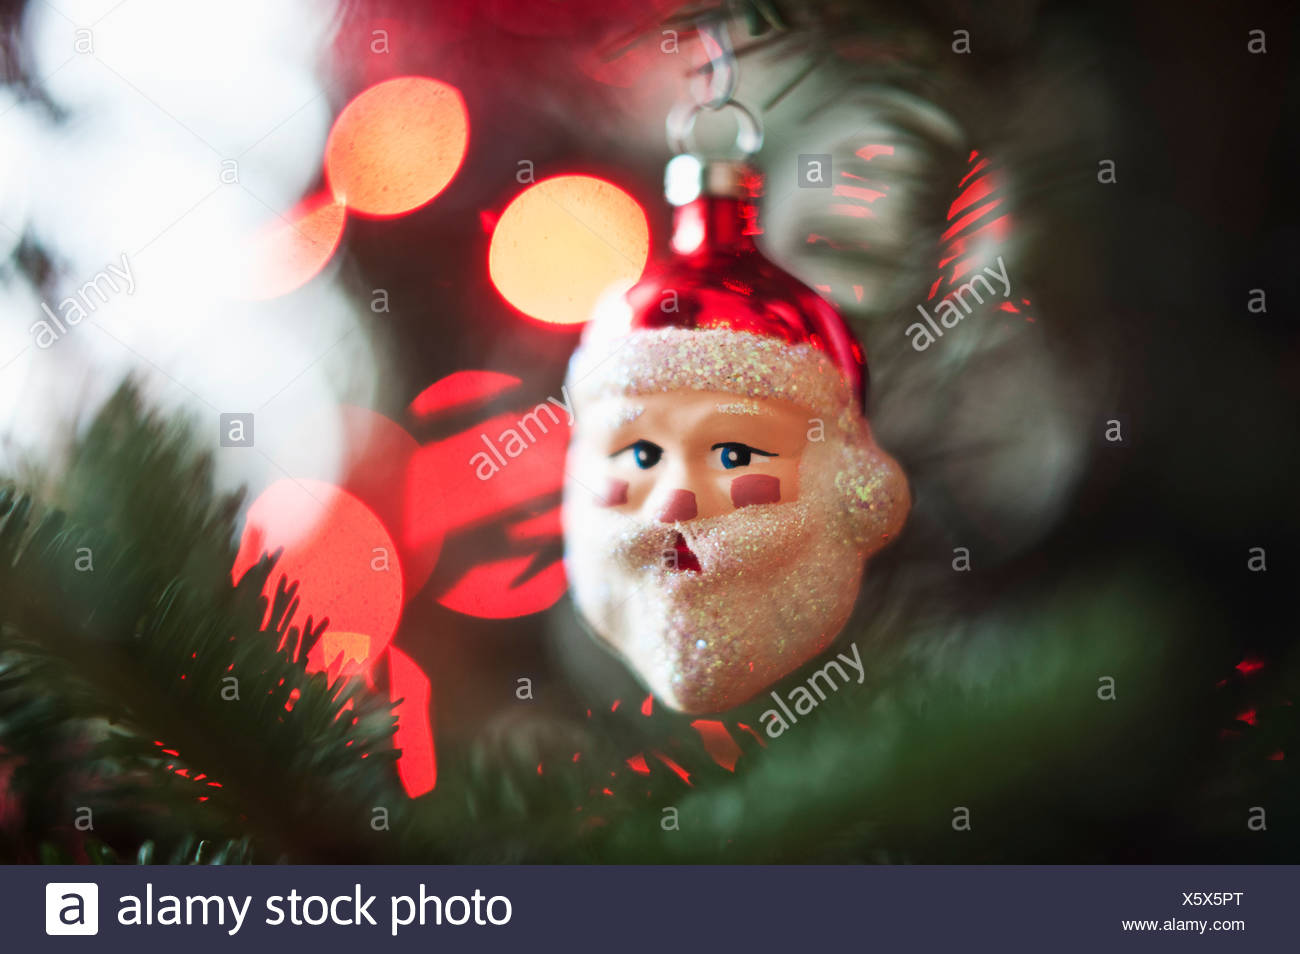 Santa Claus Christmas decoration hanging on Christmas tree, studio shot - Stock Image